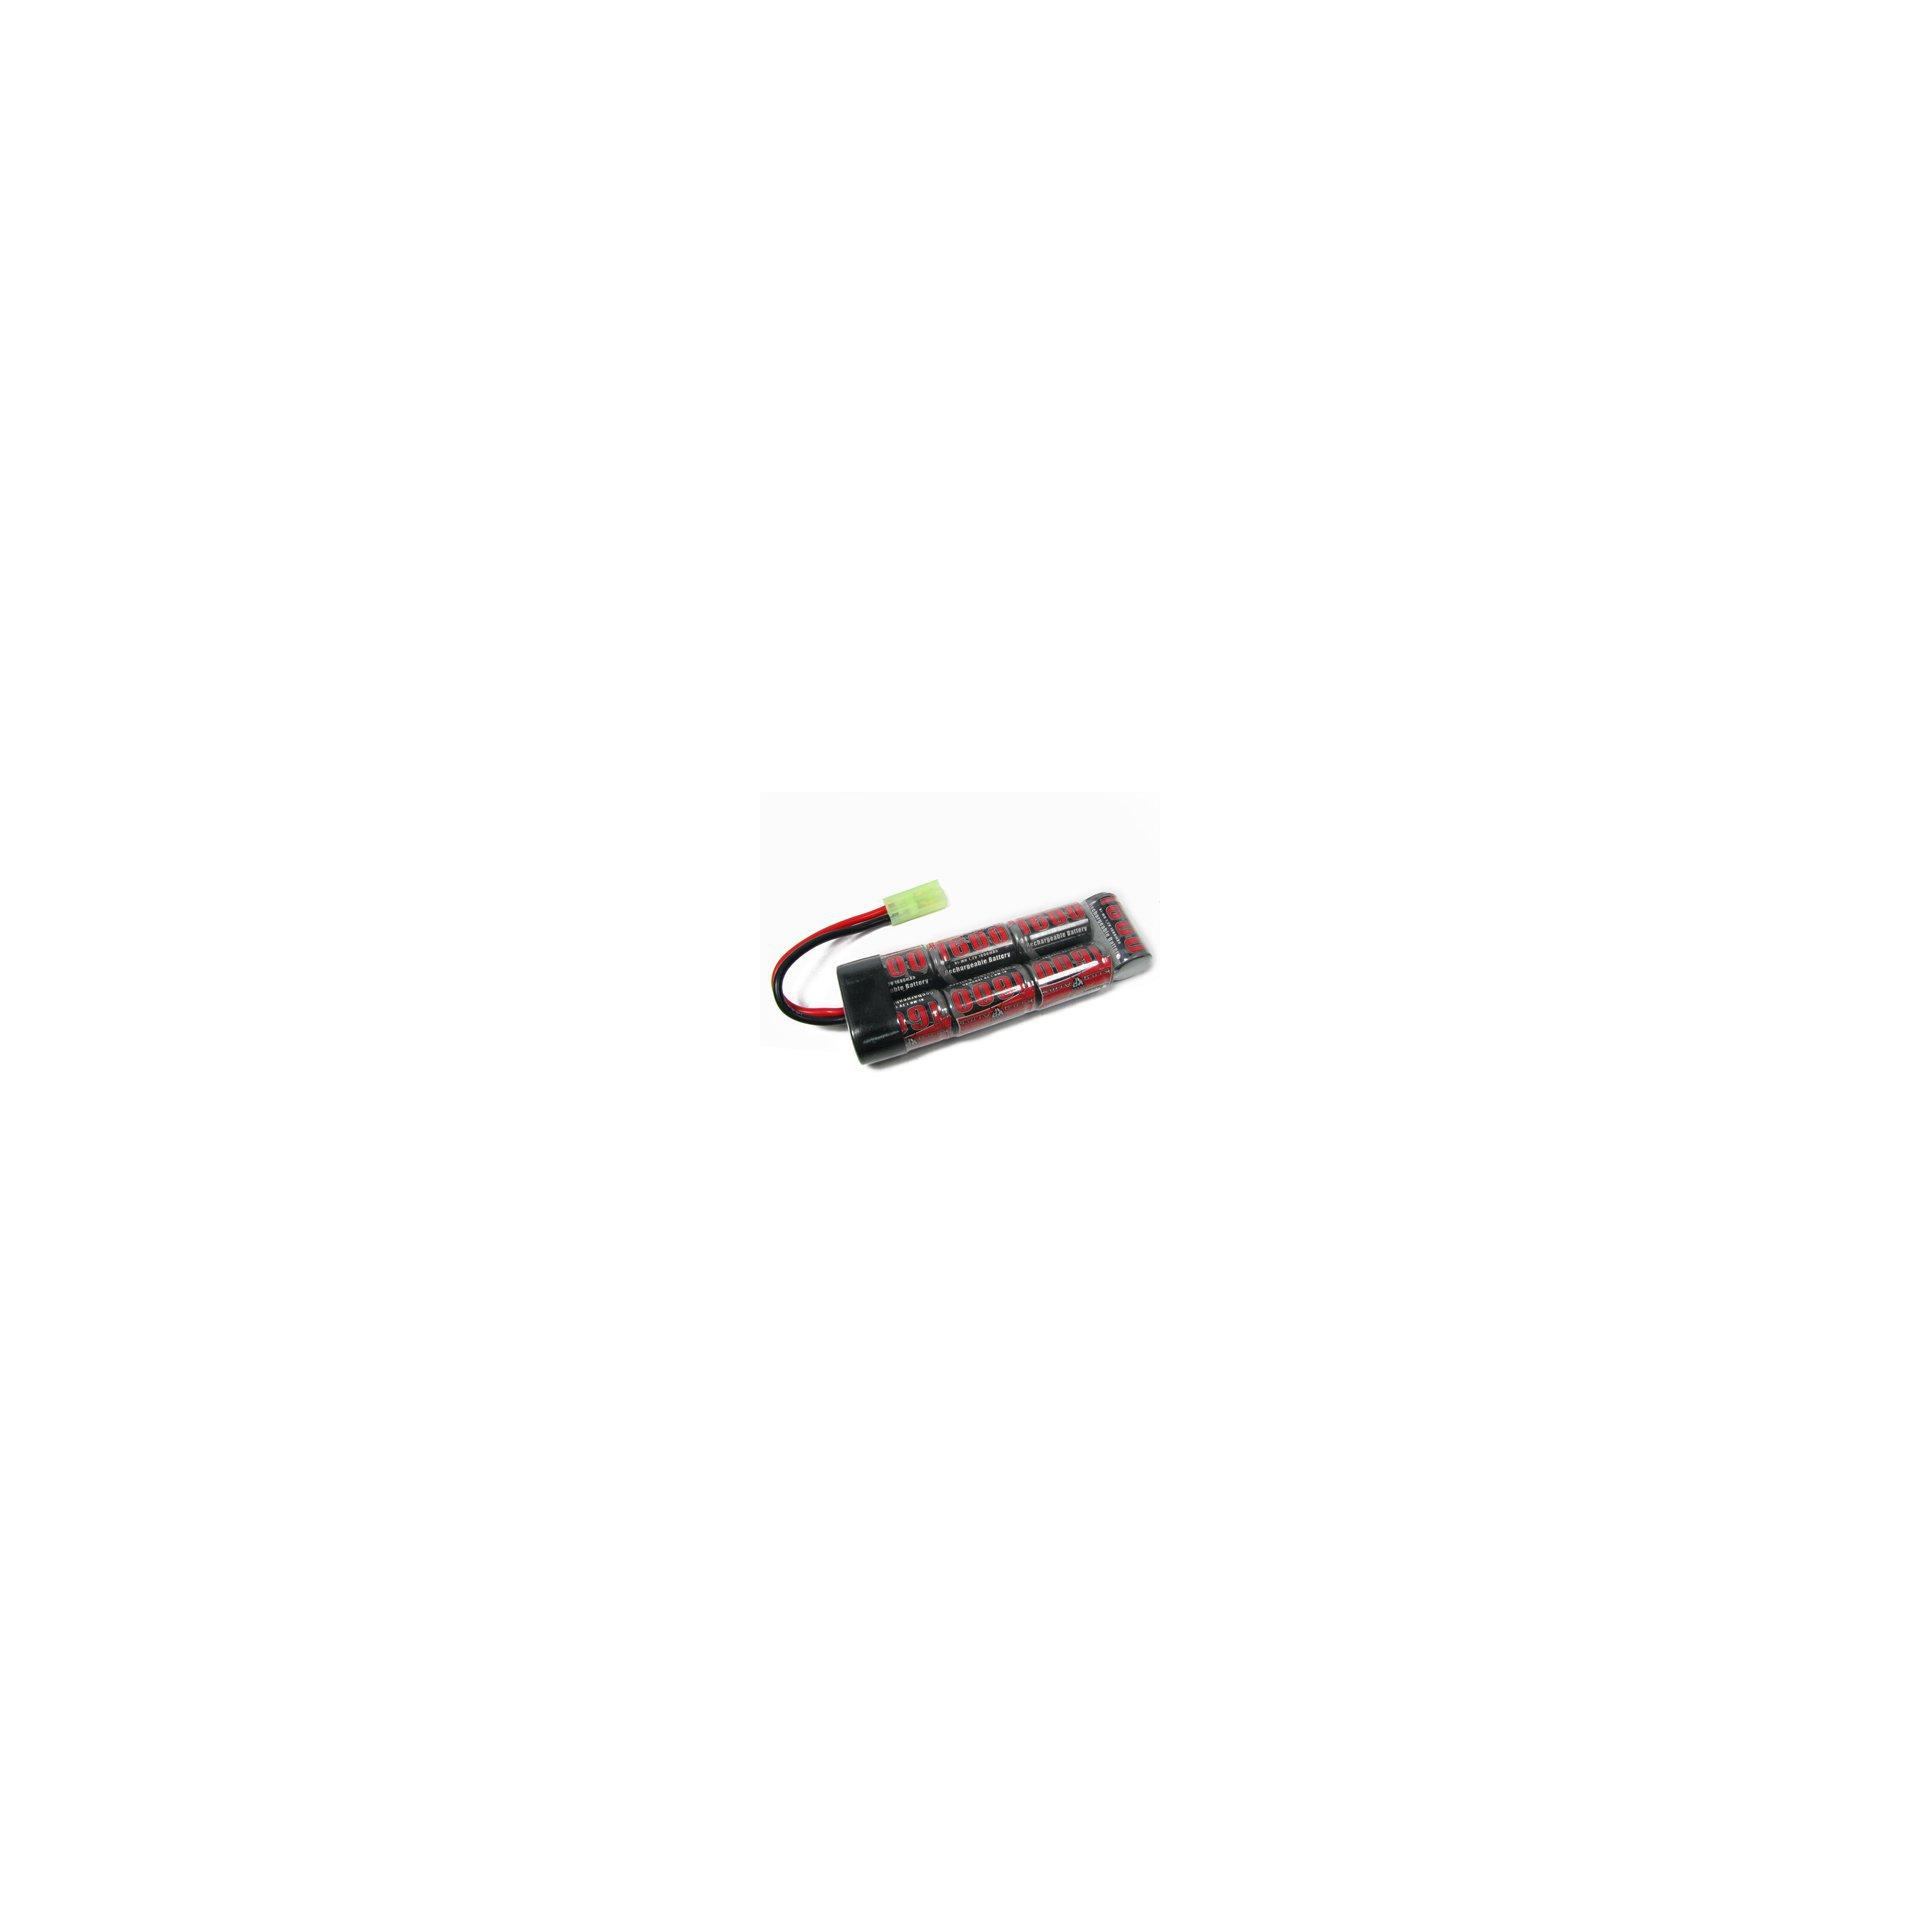 Bateria Tipo Mini P/ Airsoft 8,4 Vx 1600mah